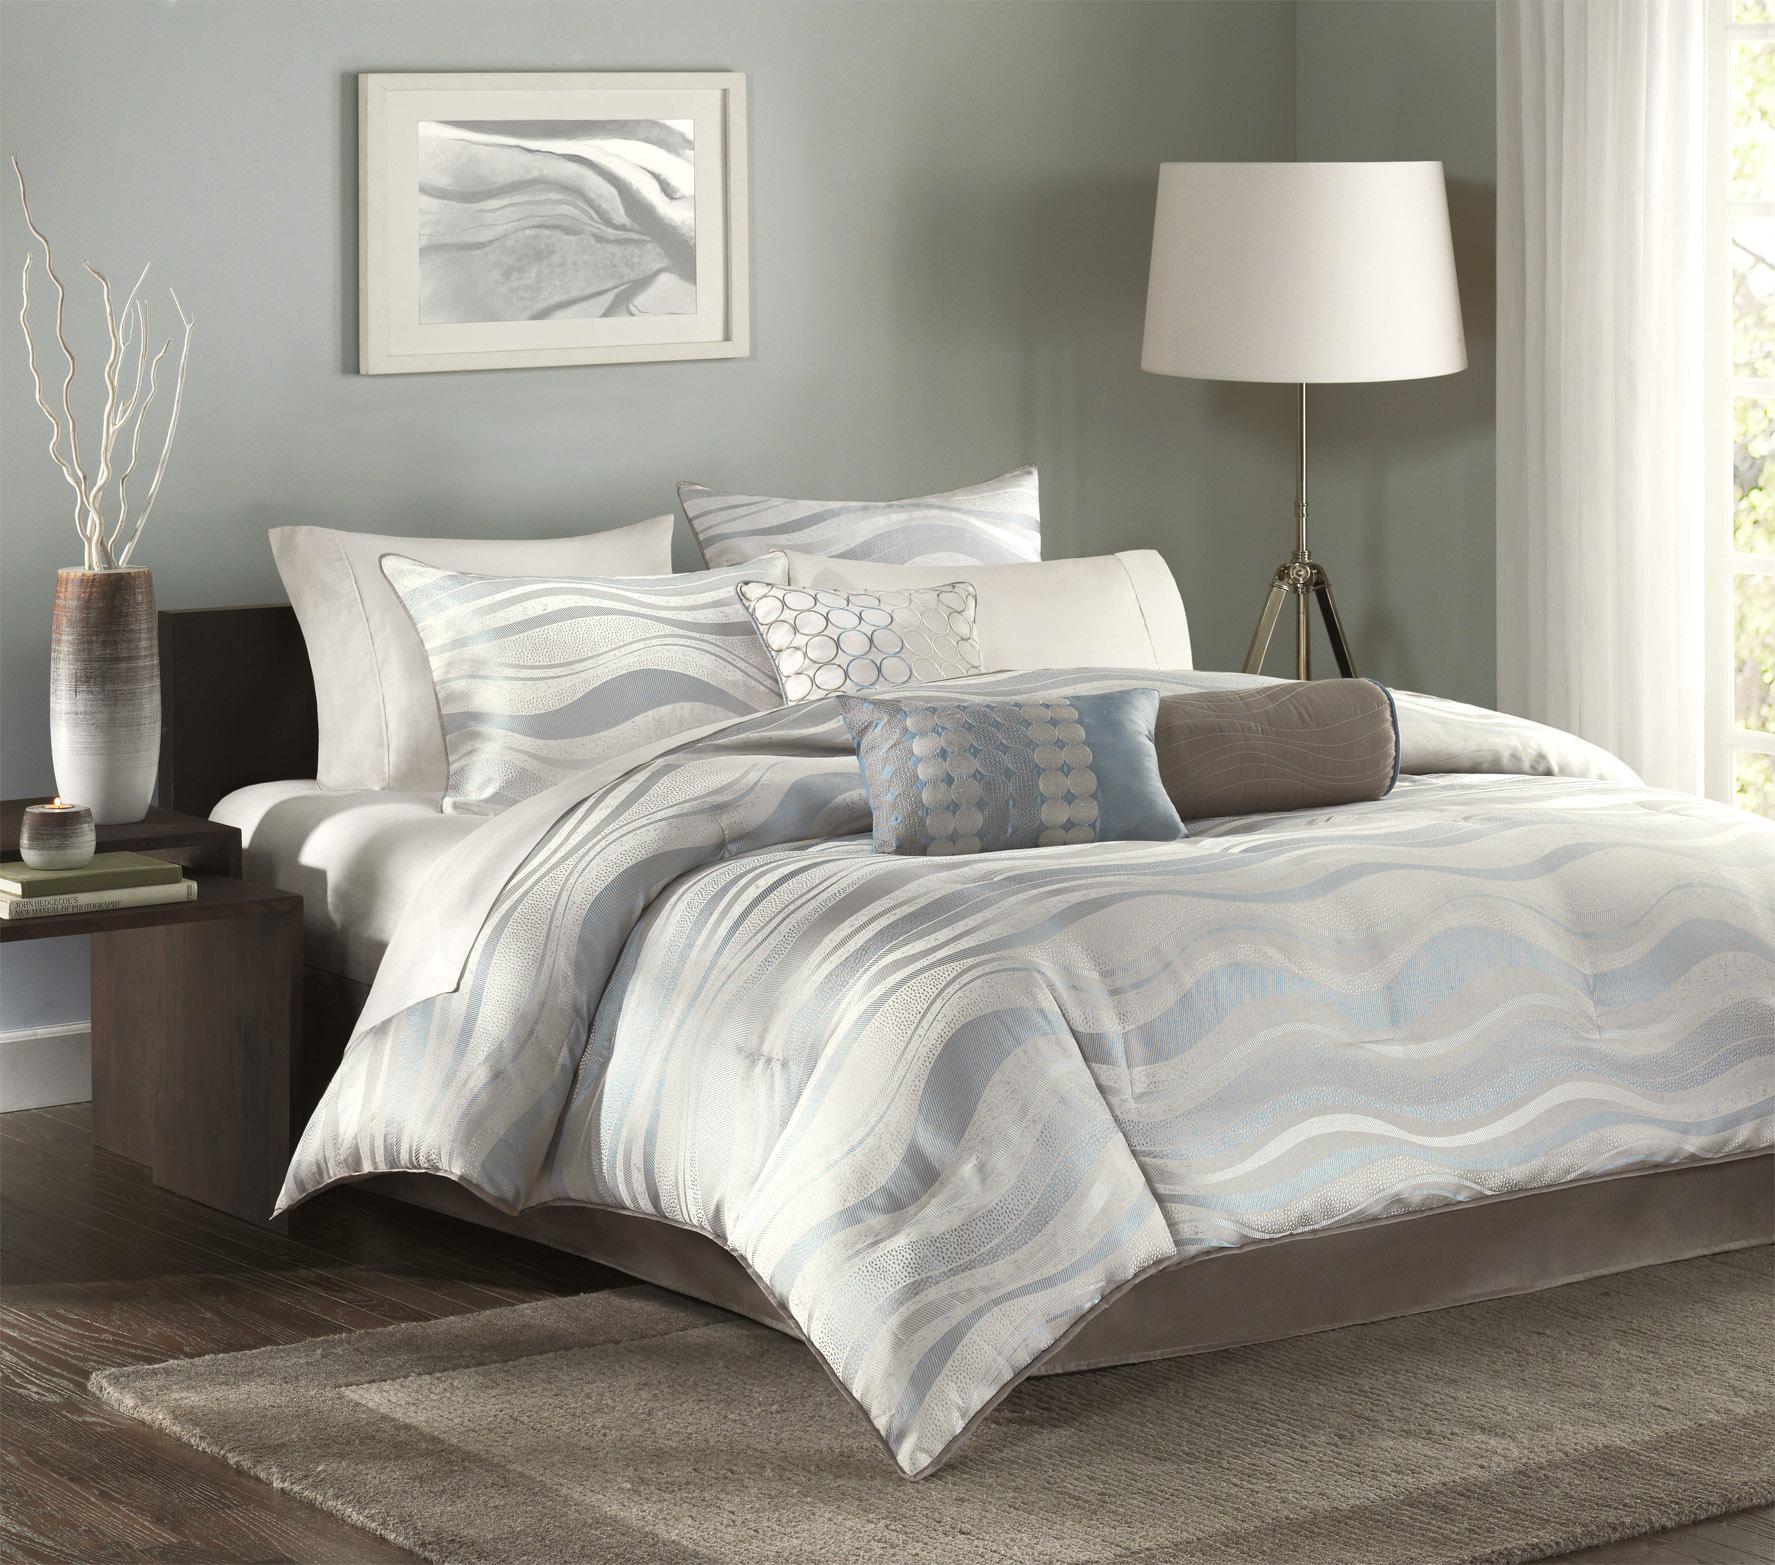 Madison Park Aegean 7-piece King/ California King-size Comforter Set